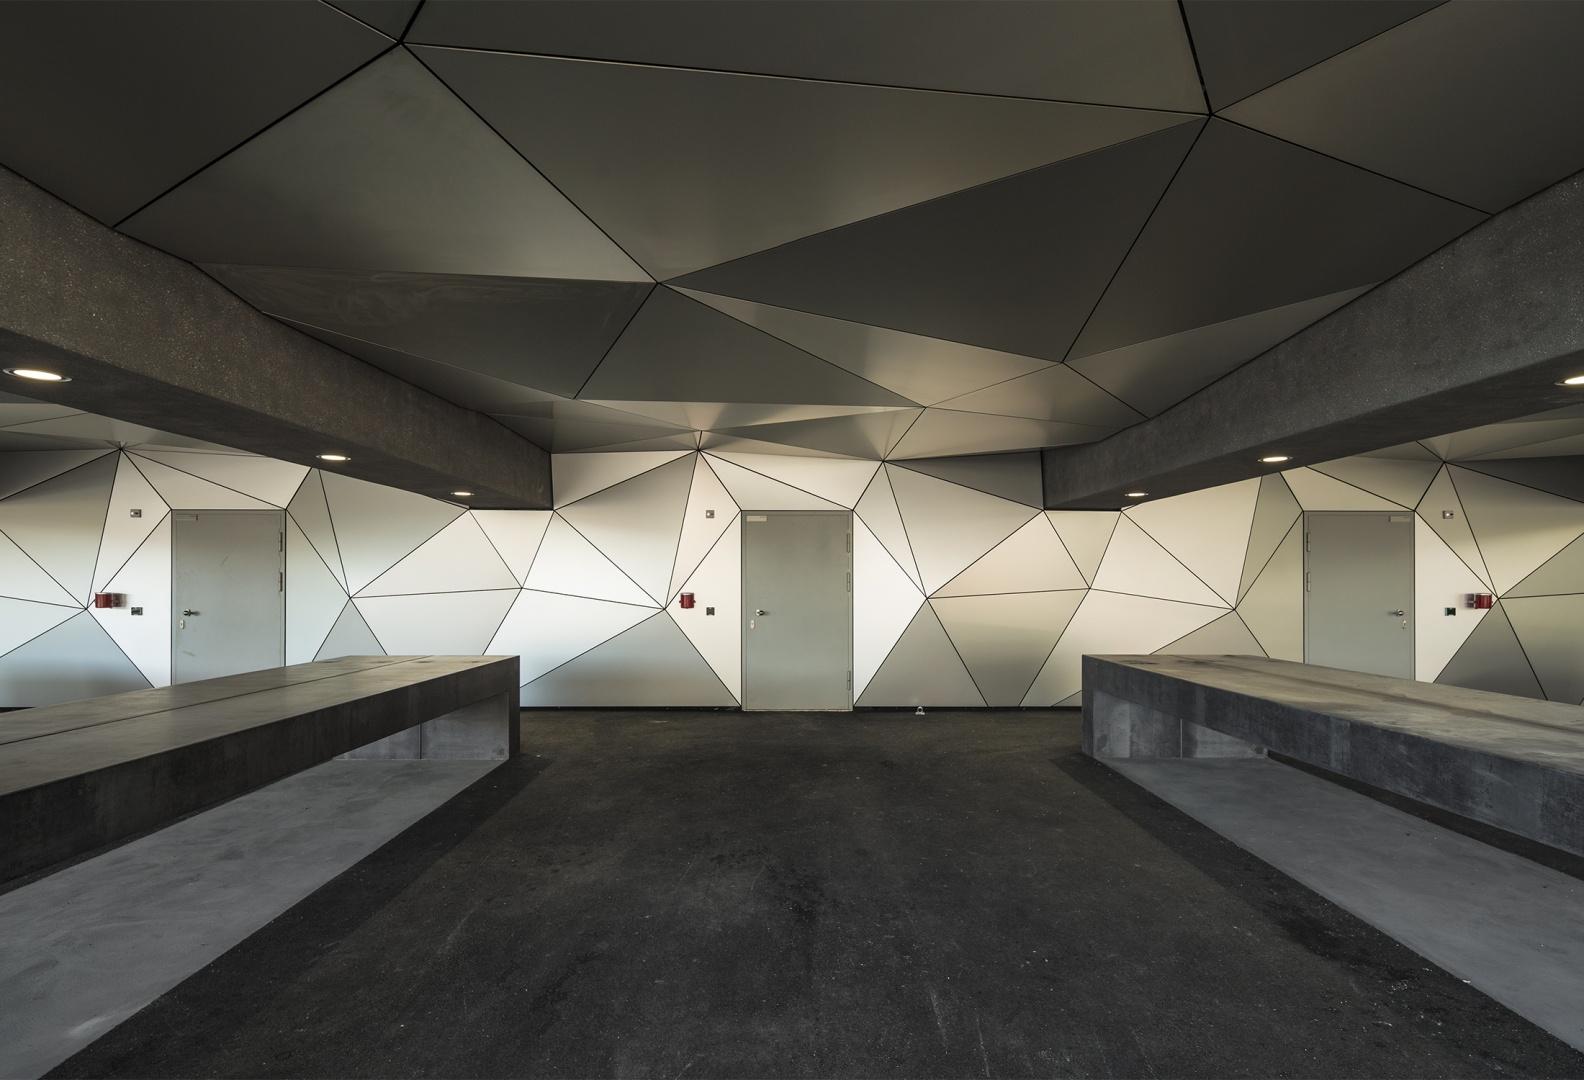 Gedeckter Platz für den Unterhalt © FERNANDO GUERRA | FG+SG FG+SG - FOTOGRAFIA DE ARQUITECTURA AV.DE ROMA, 72 - 2∫DTO-R 1700-350 LISBOA - PORTUGAL